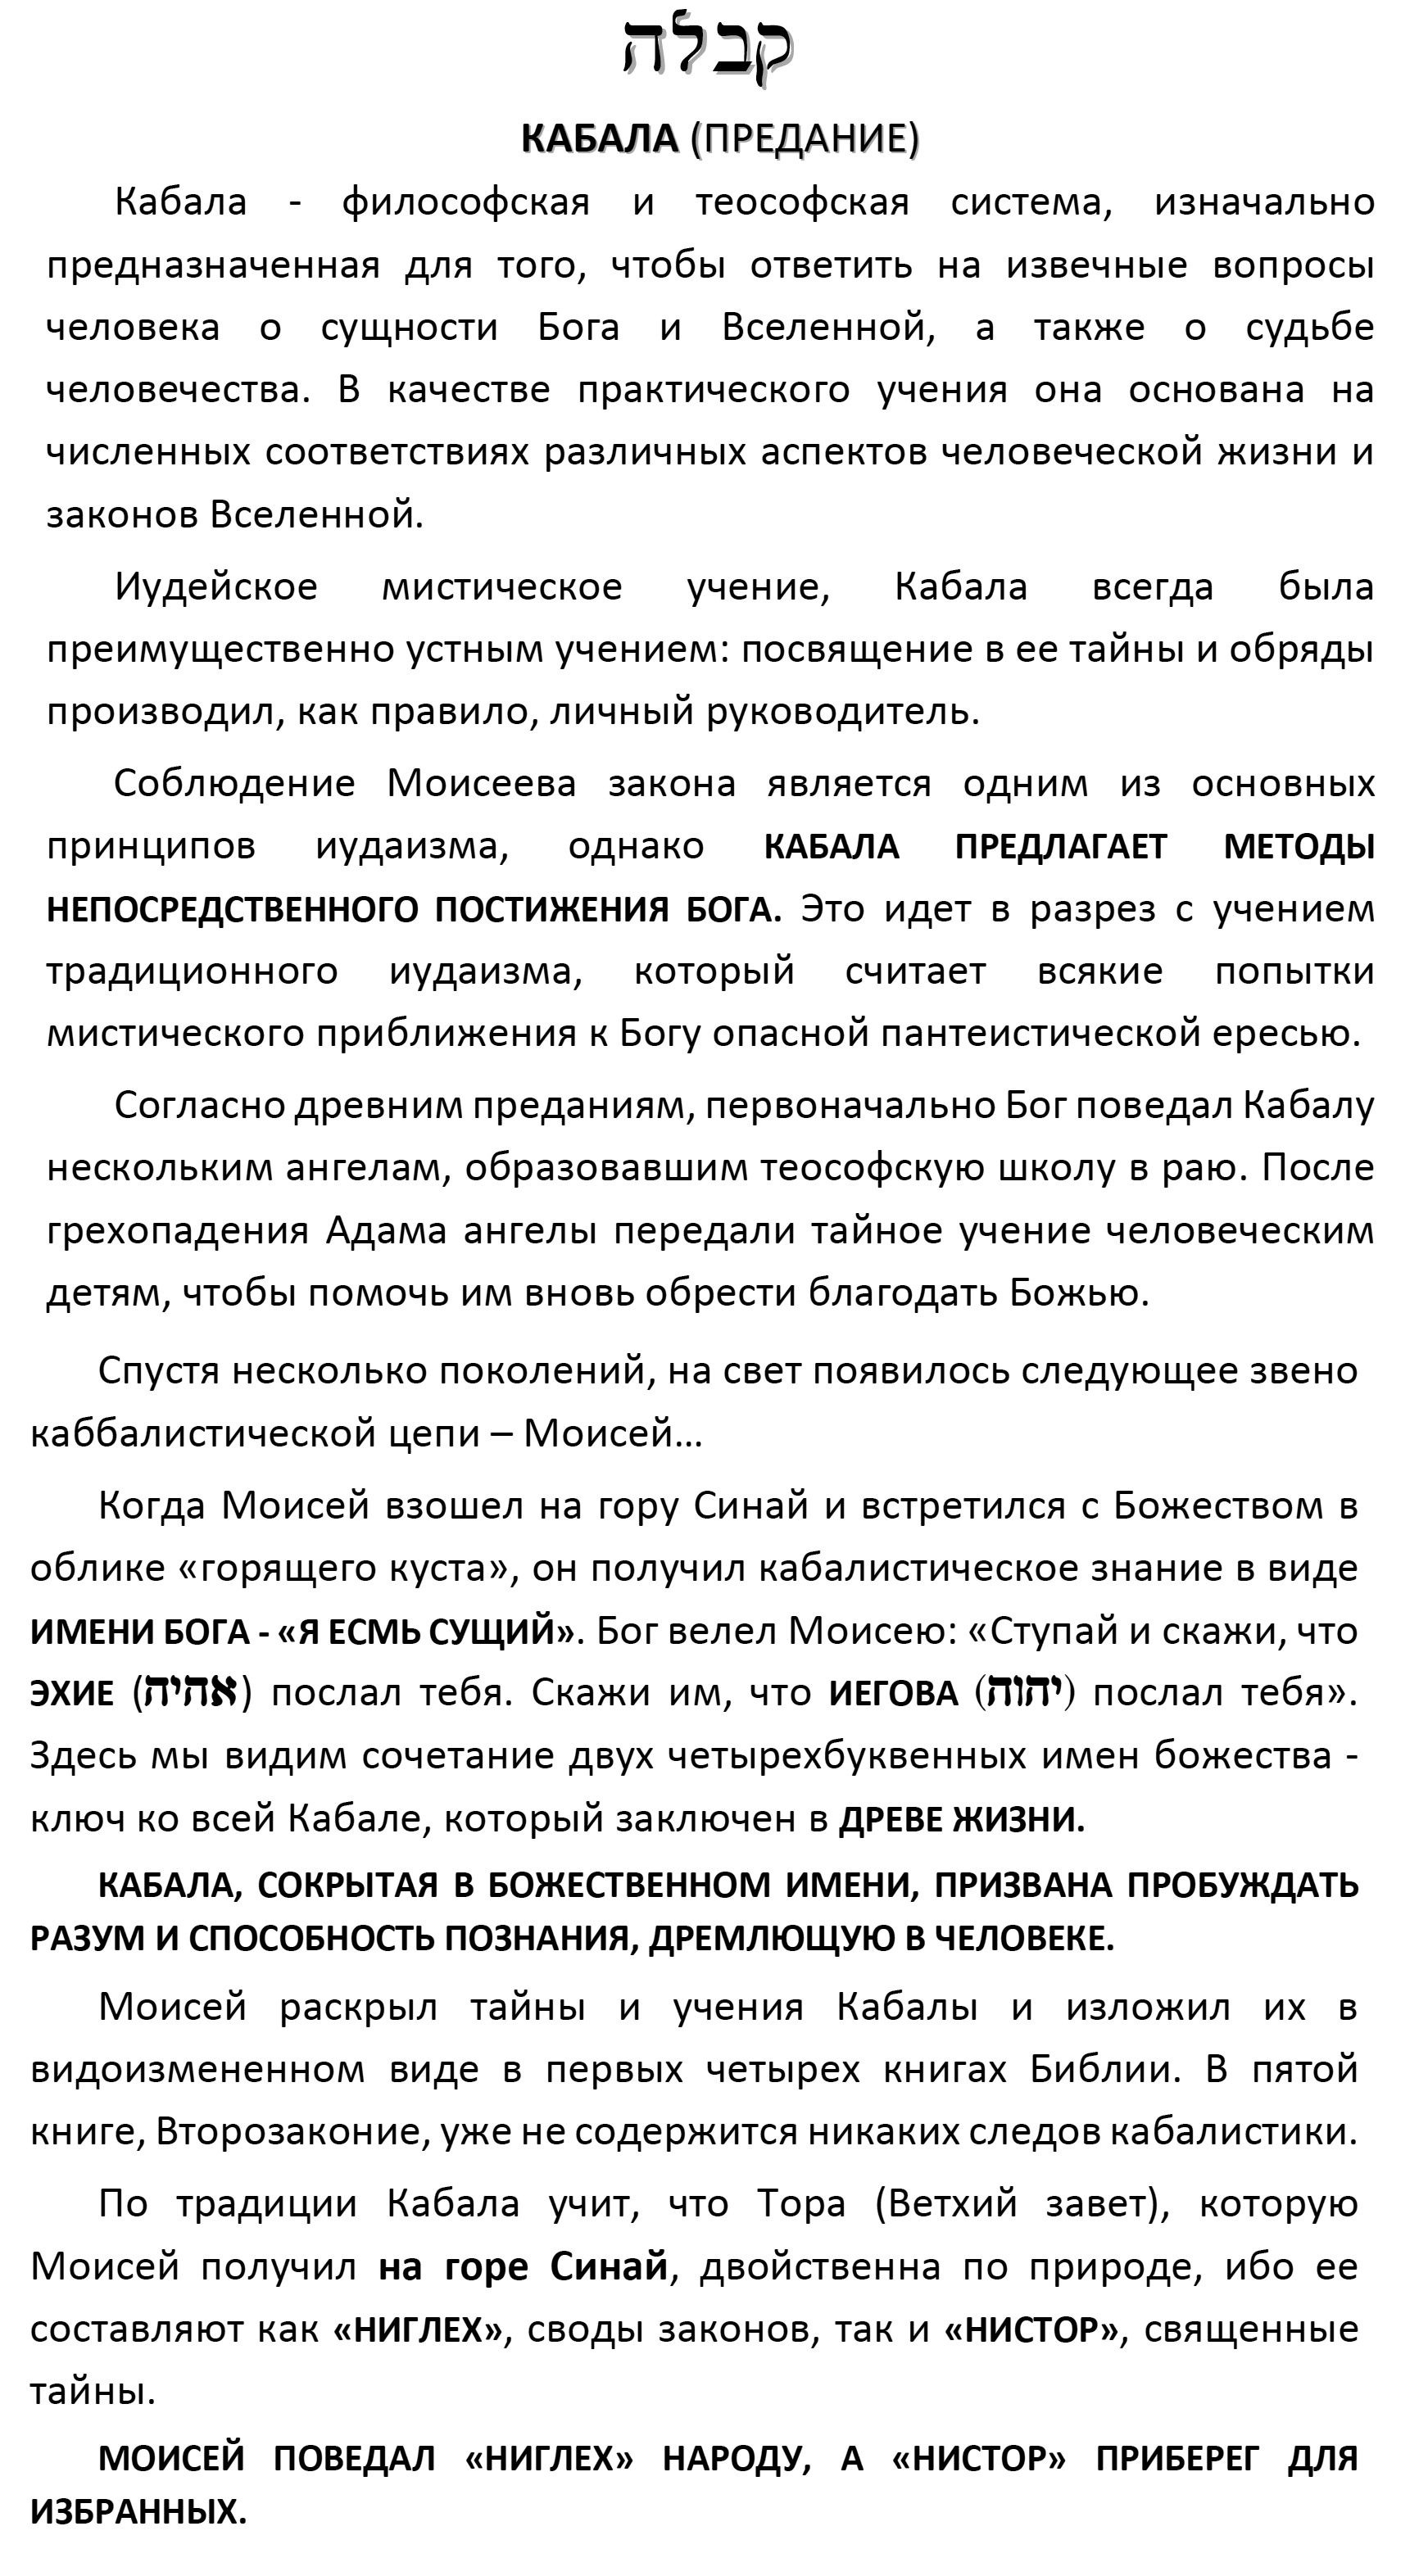 kabala-predanie-1